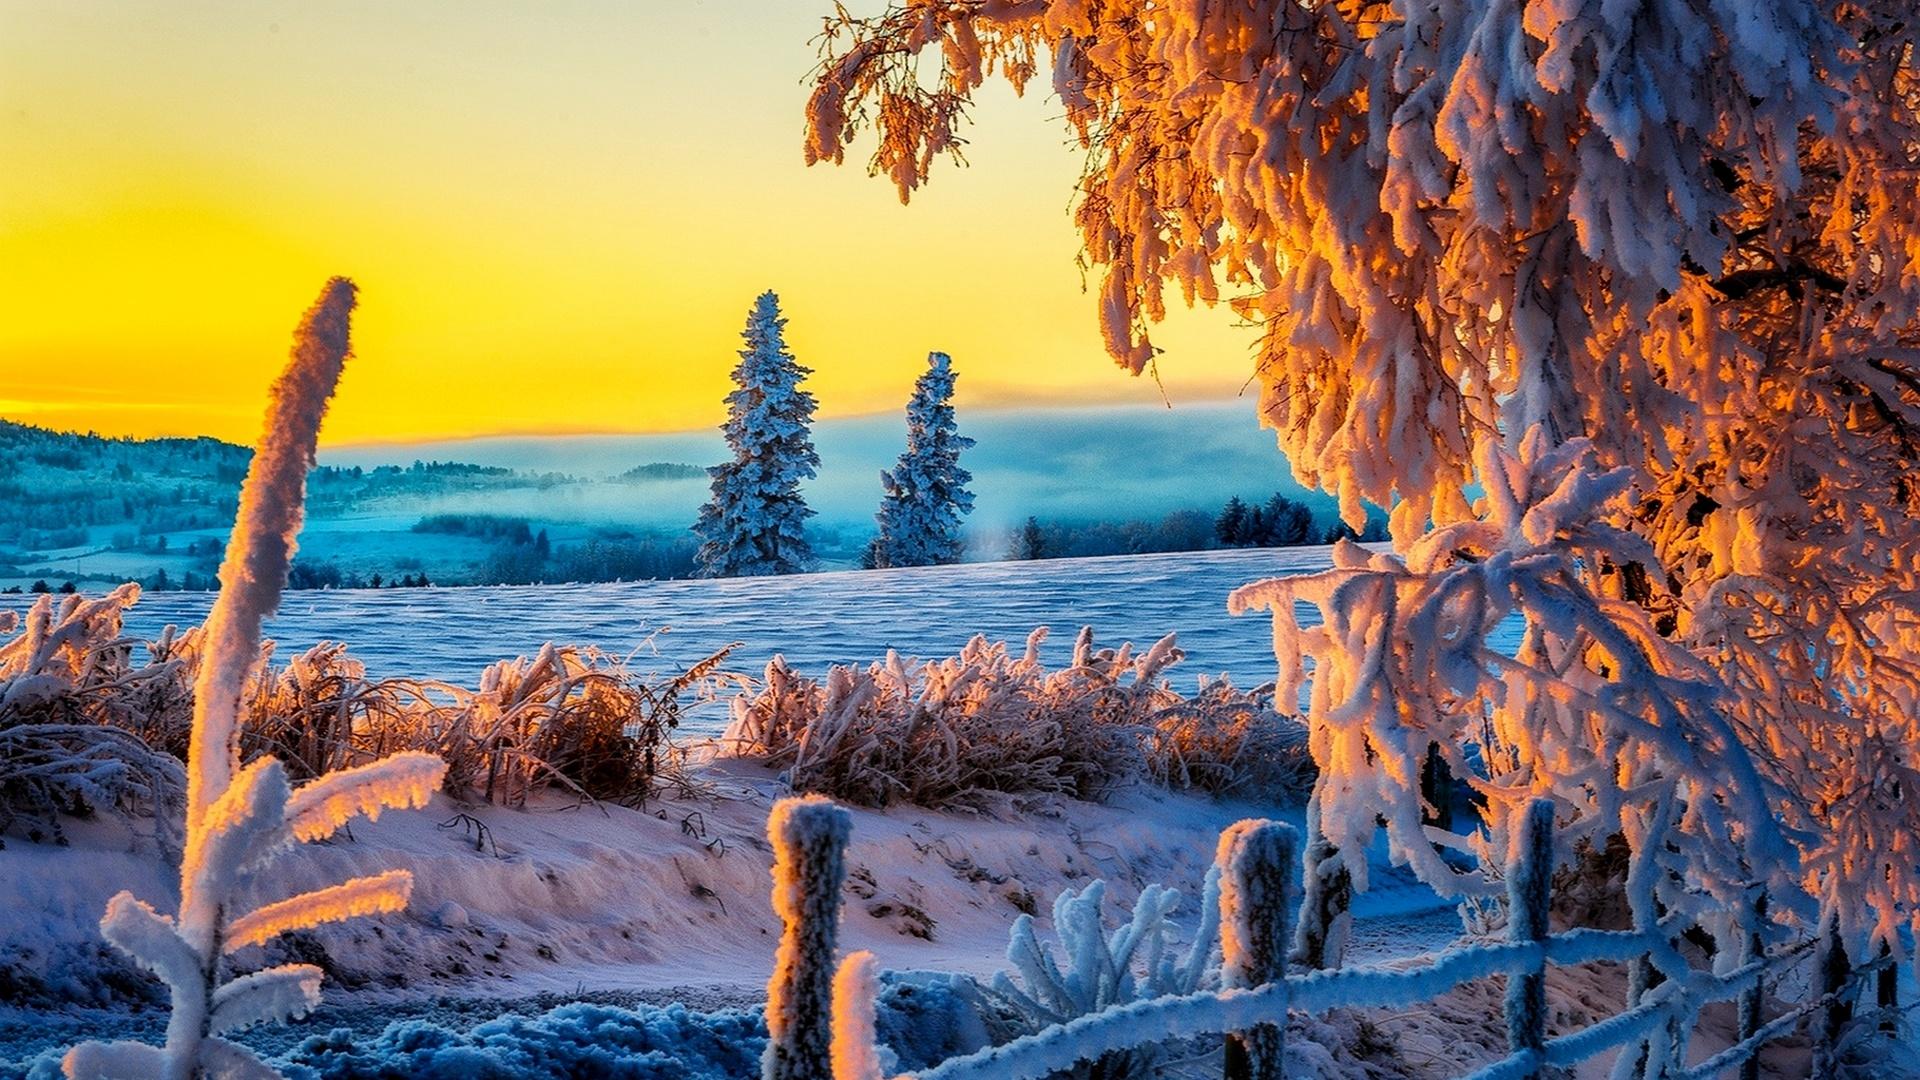 Popular Wallpaper High Quality Winter - 4k-Winter-Wallpaper-High-Quality  Collection_234224.jpeg